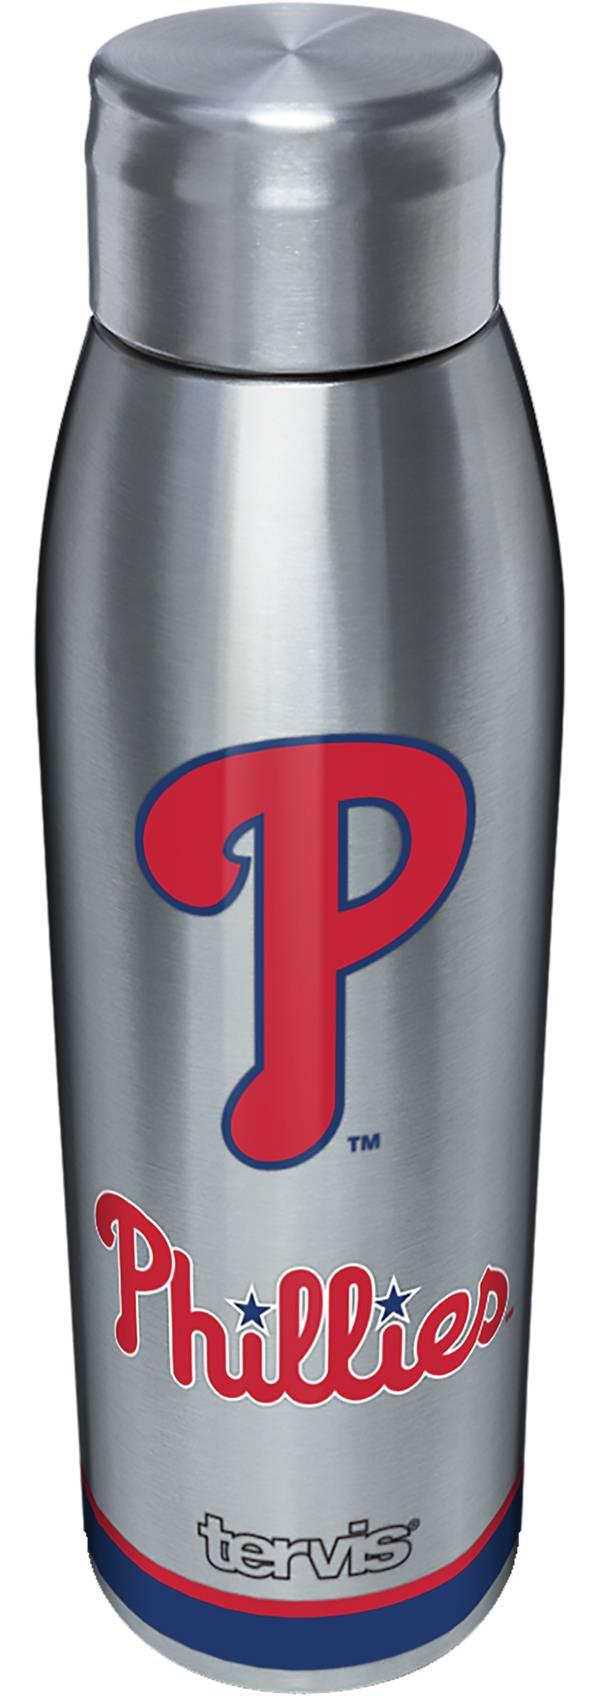 Tervis Philadelphia Phillies 17oz. Water Bottle product image